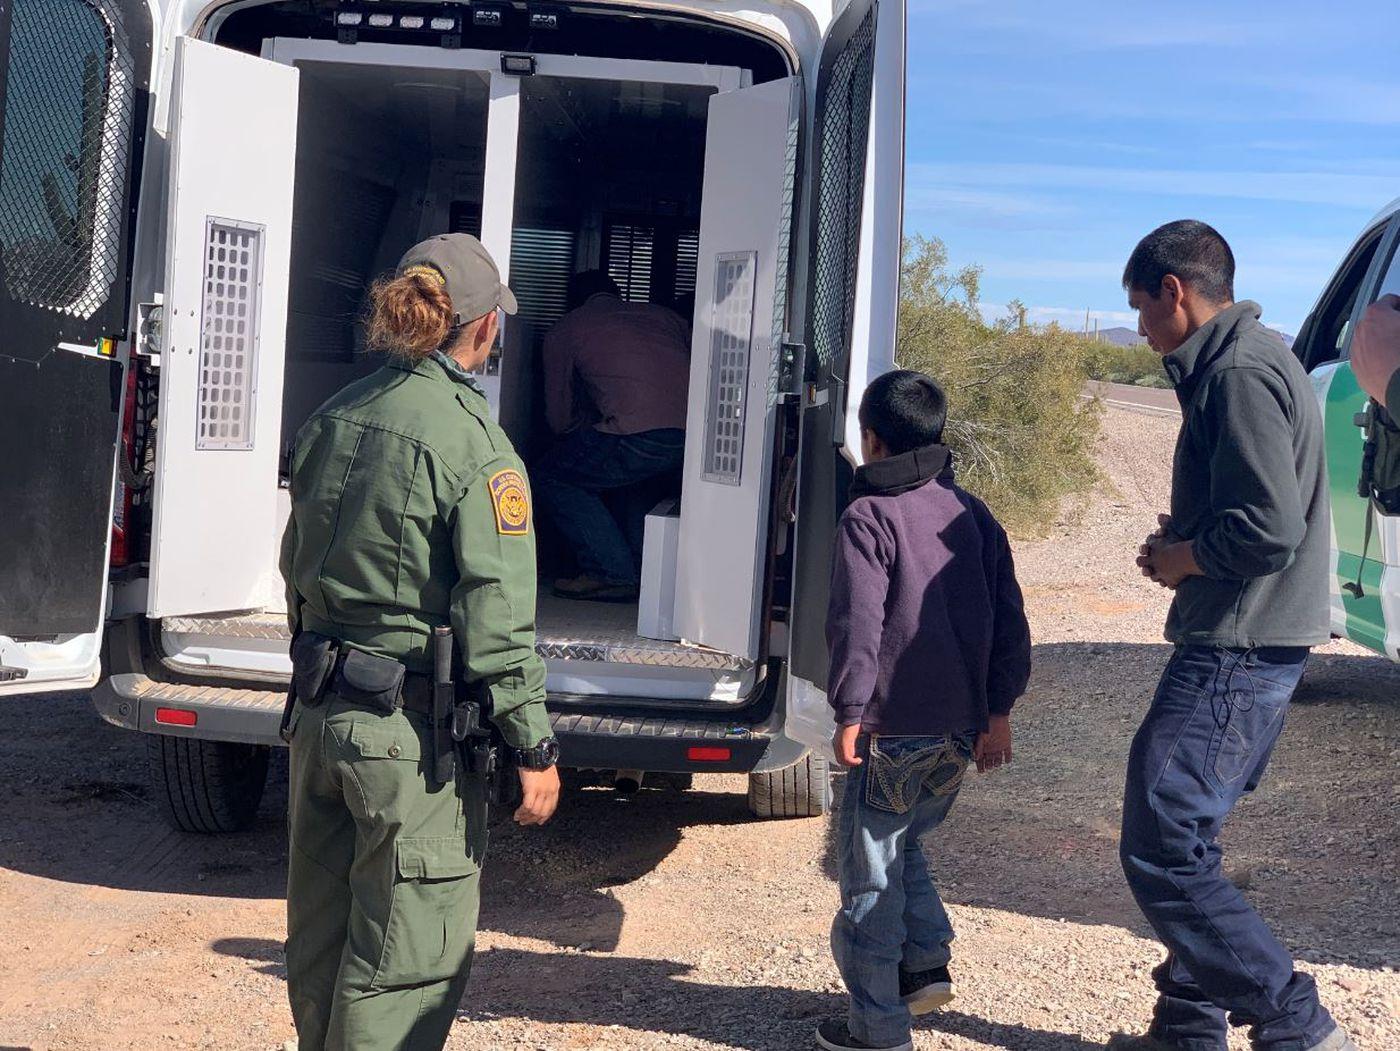 ONLY ON KOLD: Migrants take advantage of border